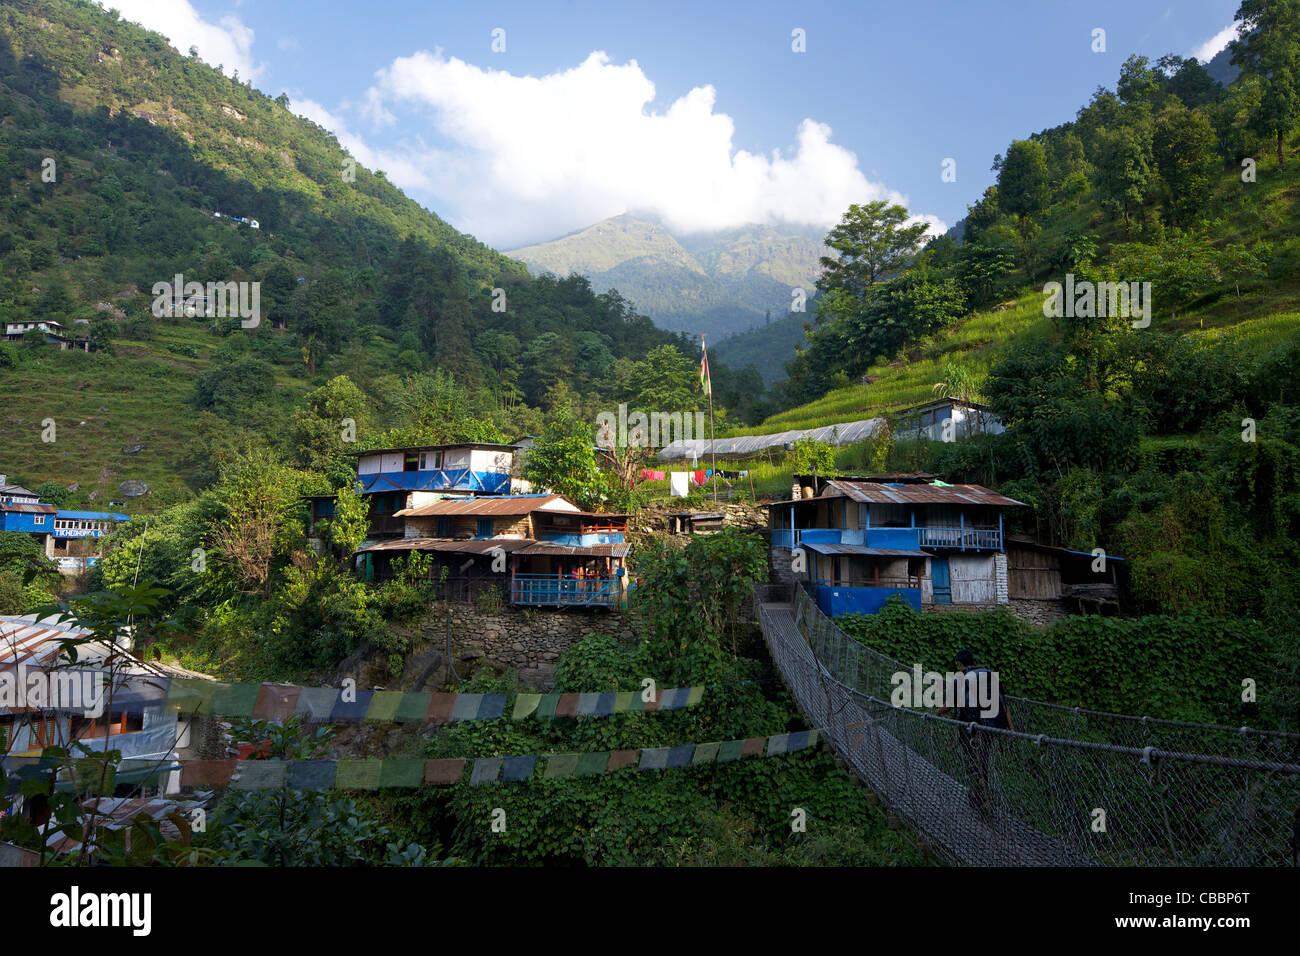 Trekker crossing suspension bridge near Ulleri, Annapurna Sanctuary Region, Himalayas, Nepal, Asia - Stock Image